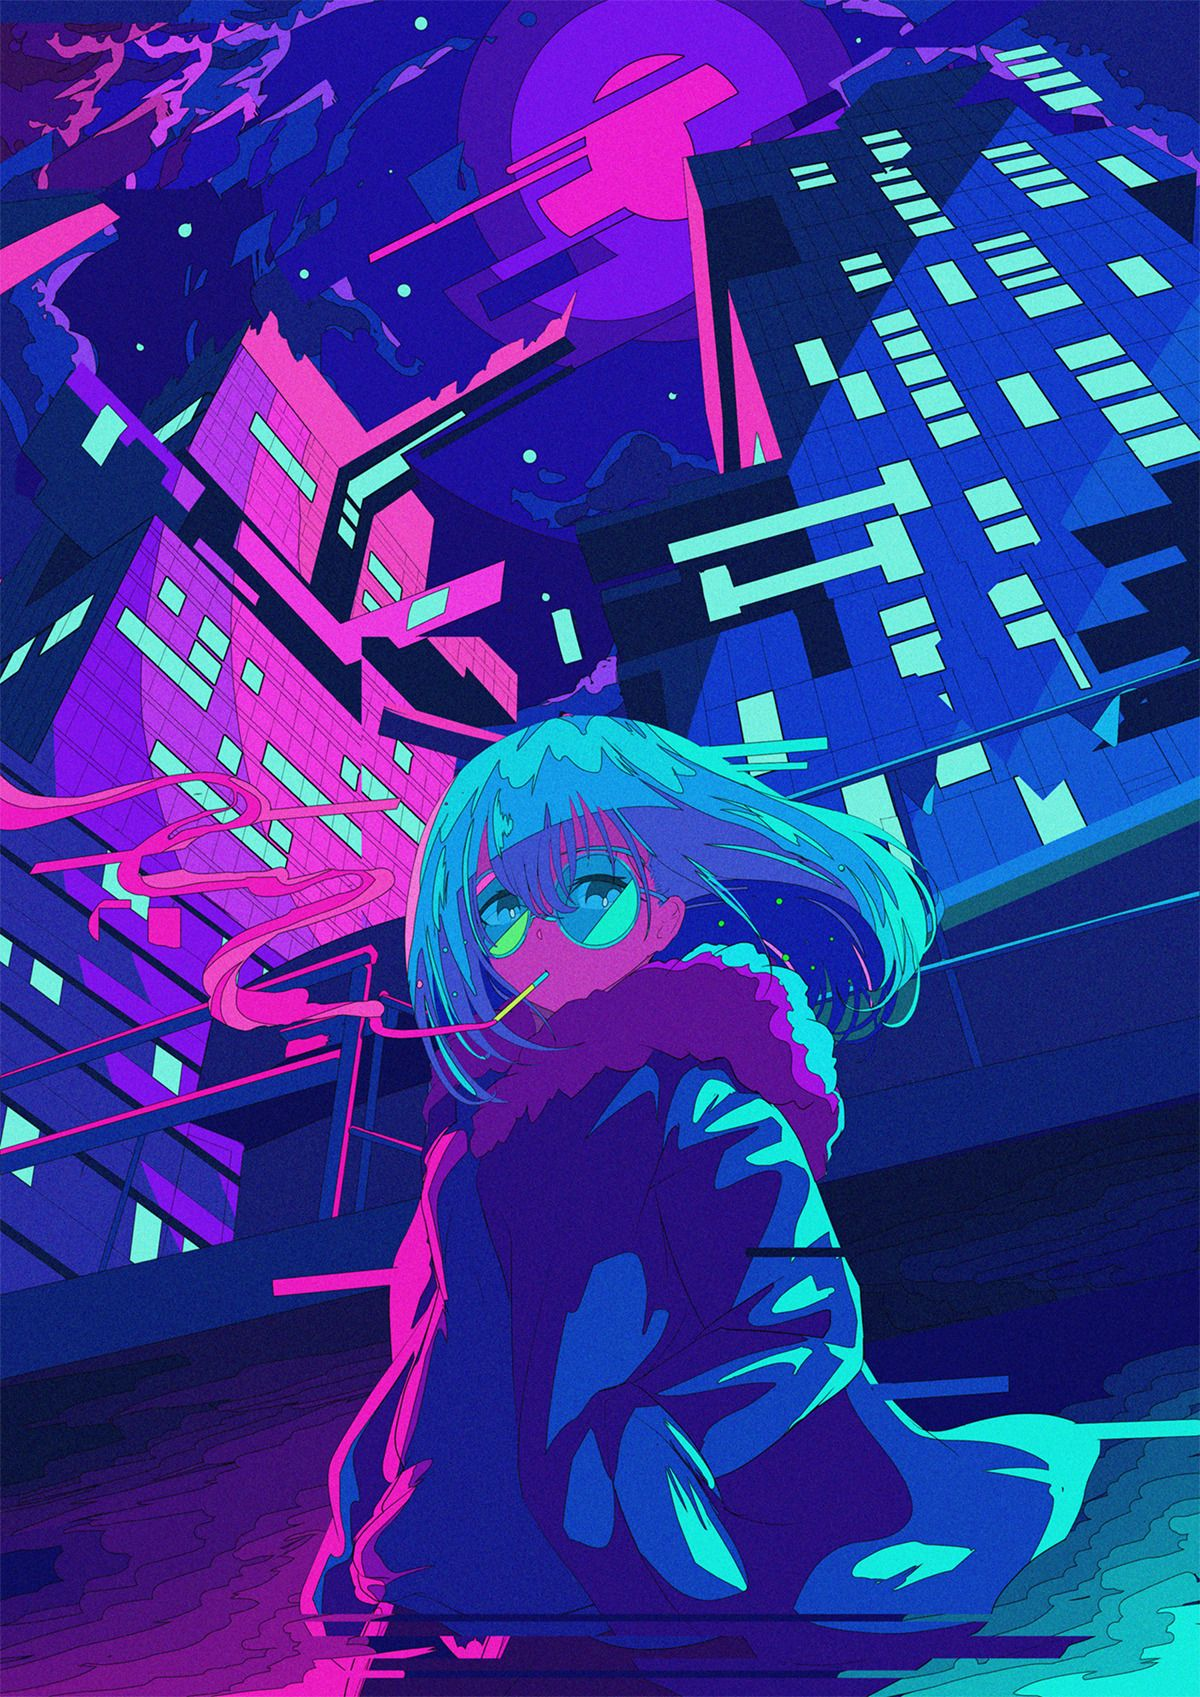 Pin By Tashan On Yeah Yeah Cyberpunk Anime Neon Art Kawaii Art